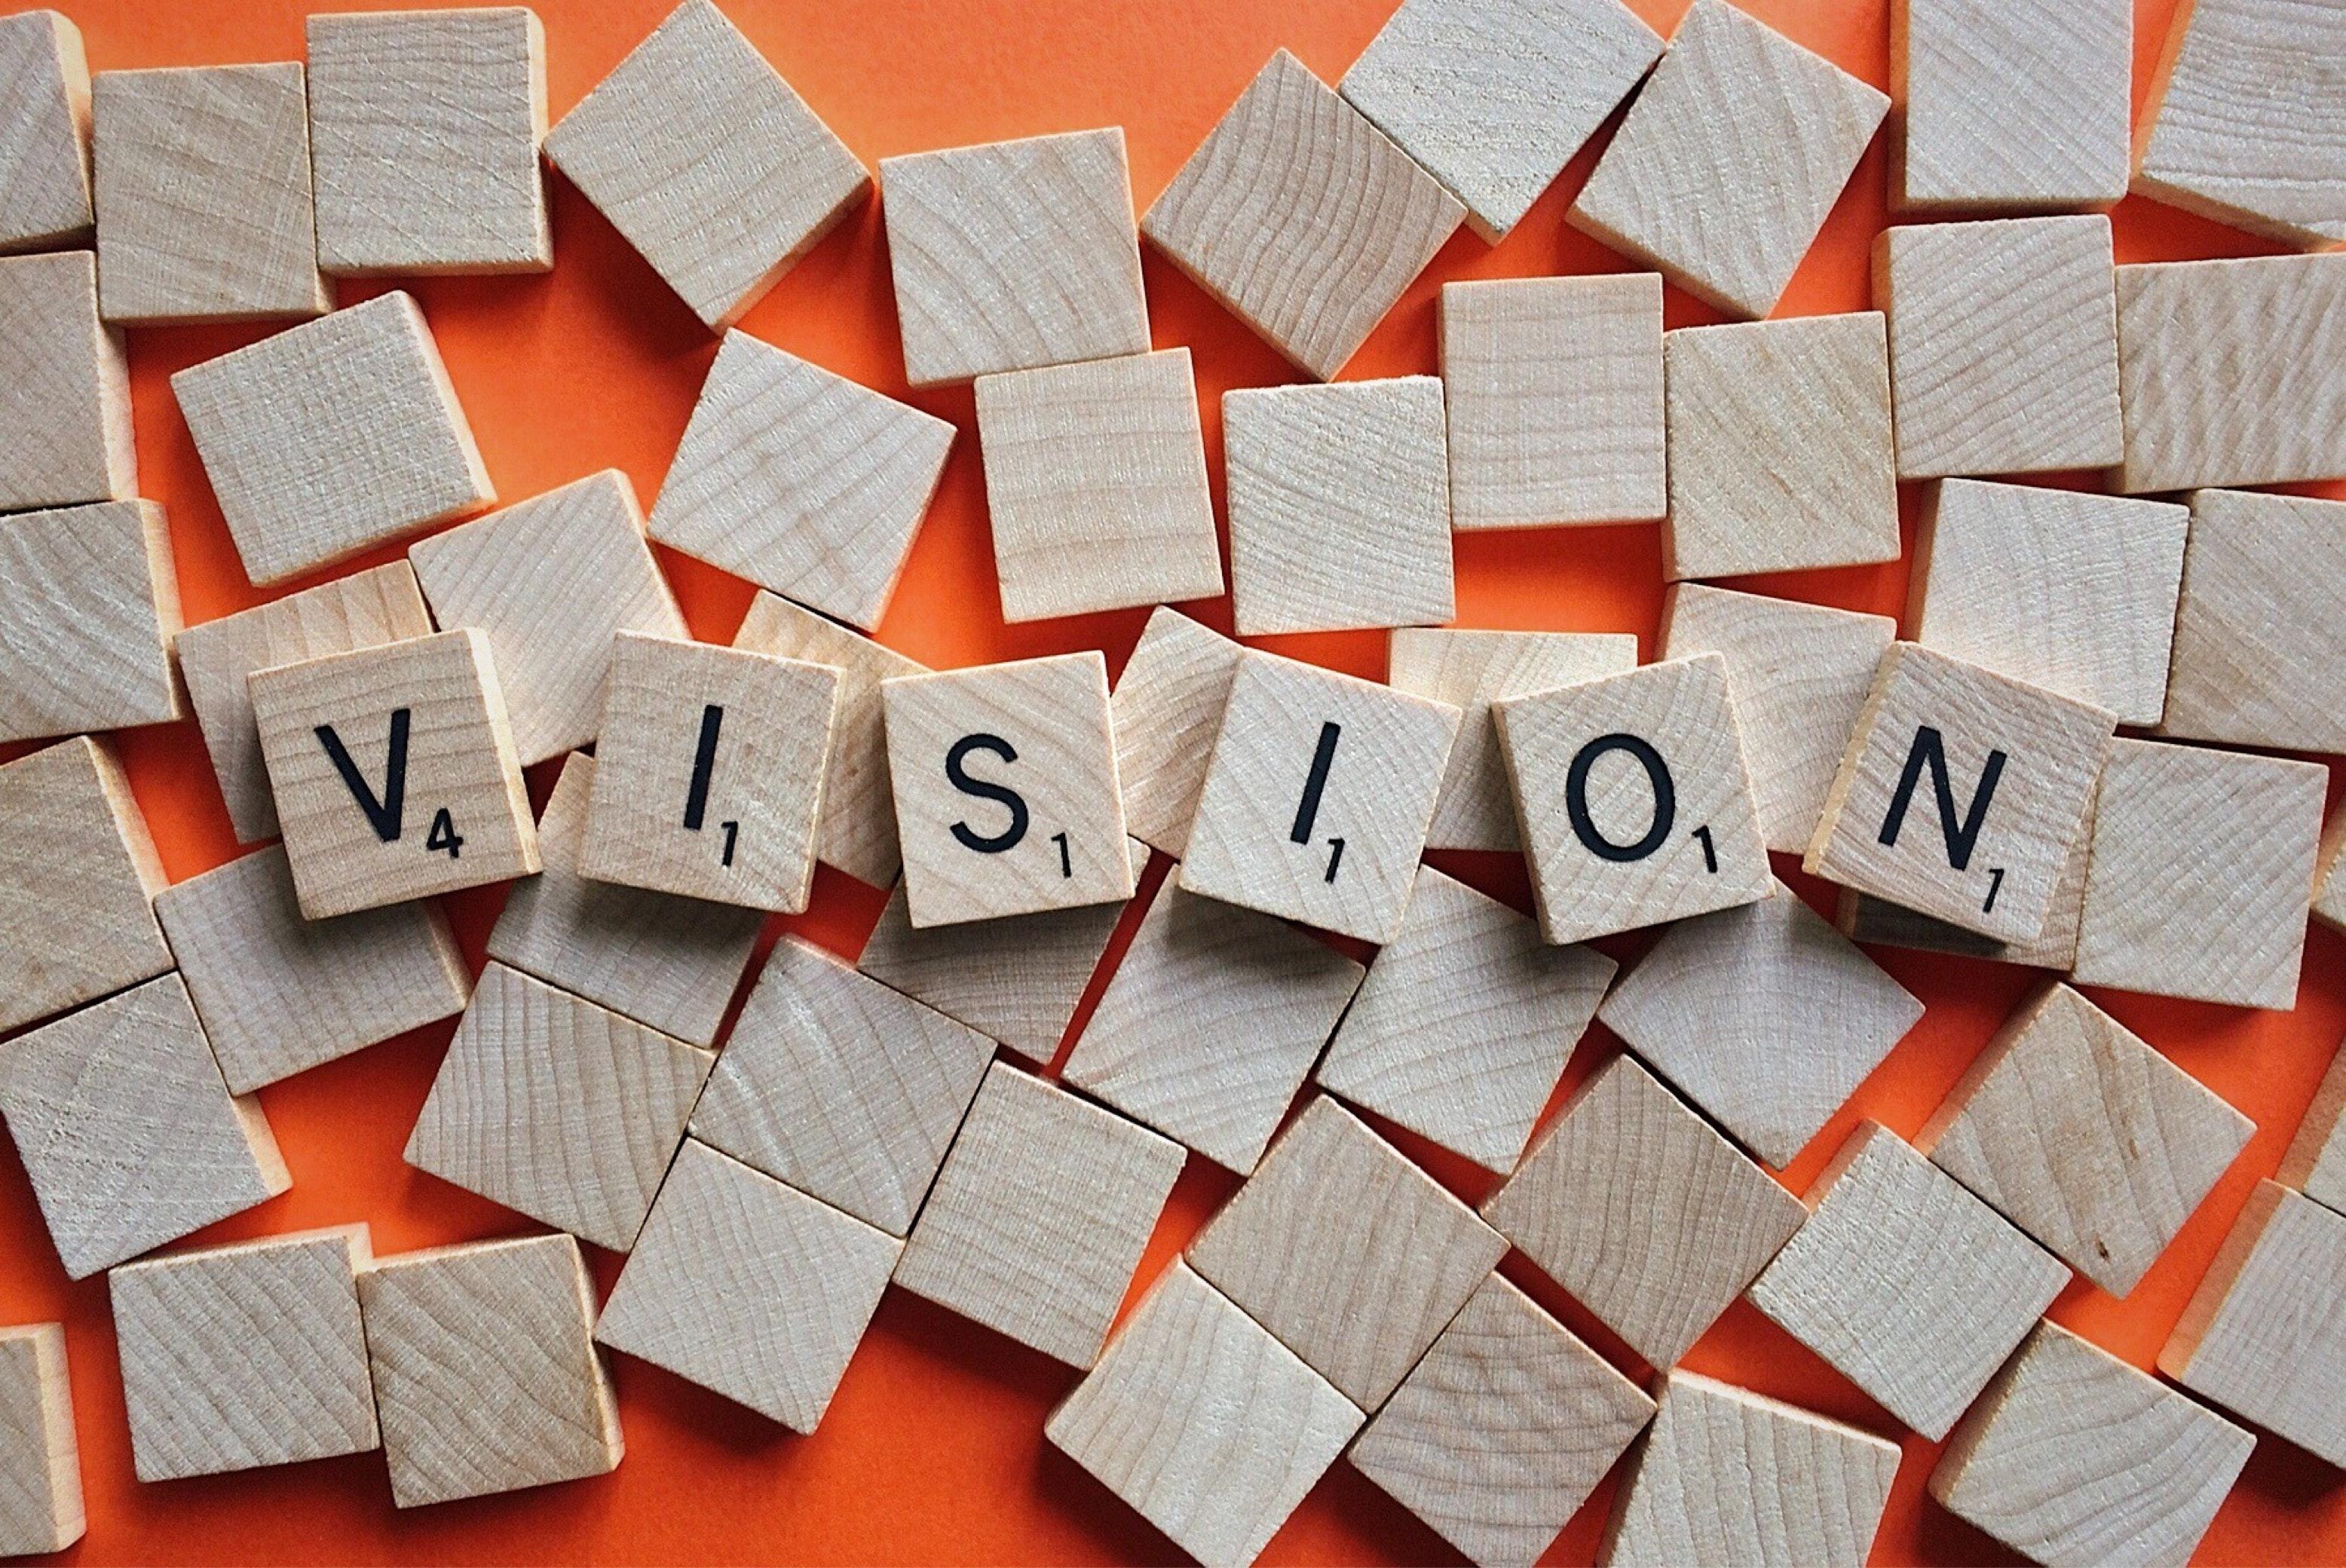 alphabet-cube-mission-462353